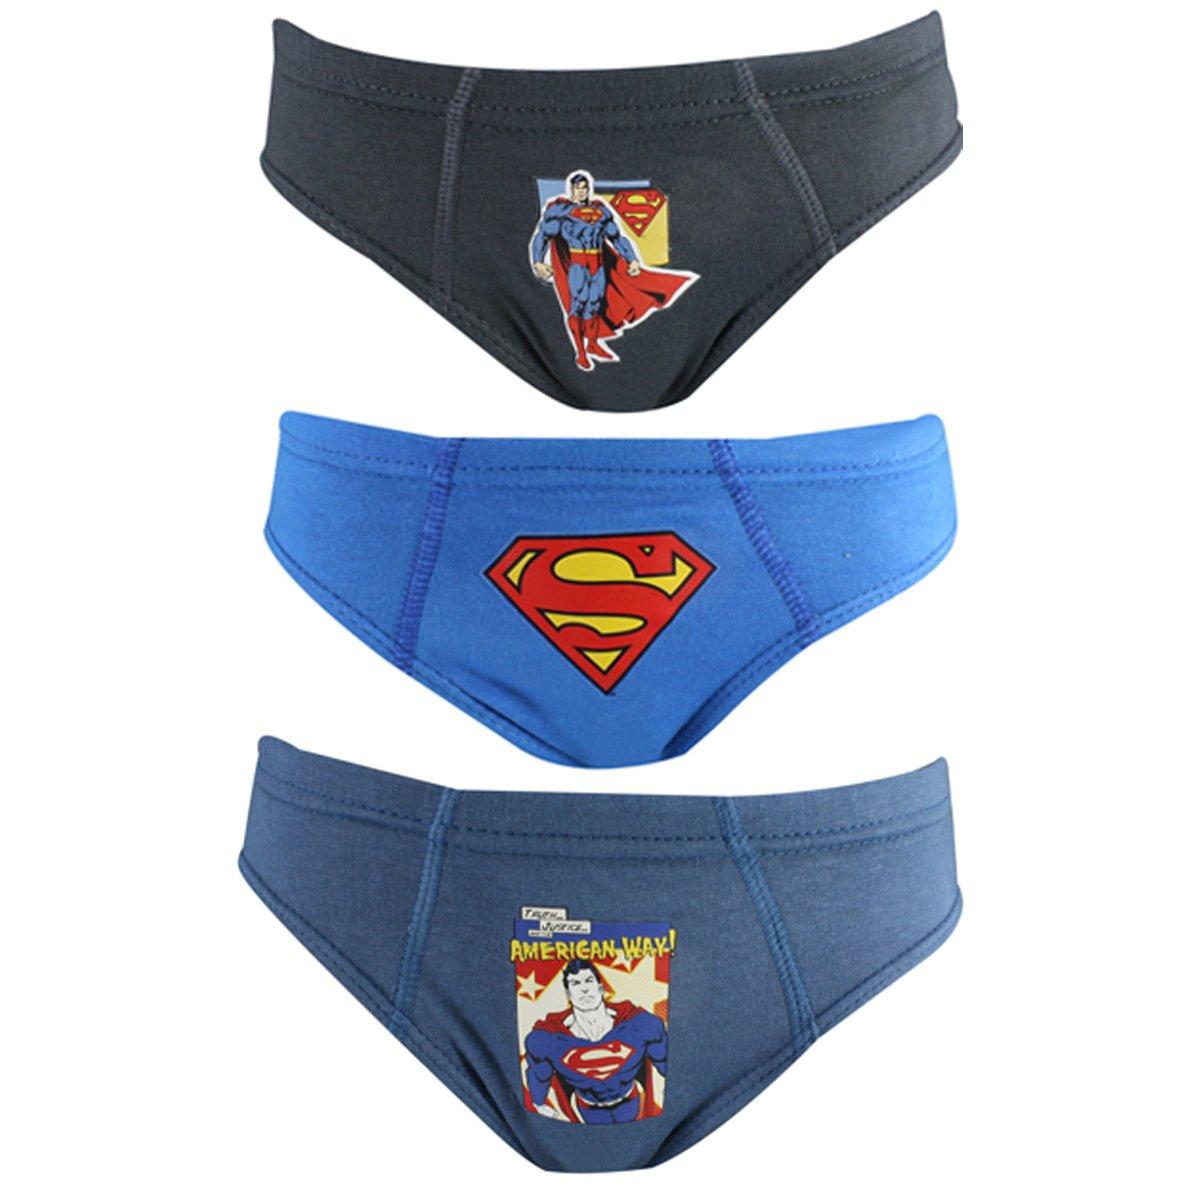 b9fcc8fb9 Kit C 3 Cueca Lupo Infantil Slip Superman 130 089 0921 - Azul Cinza ...